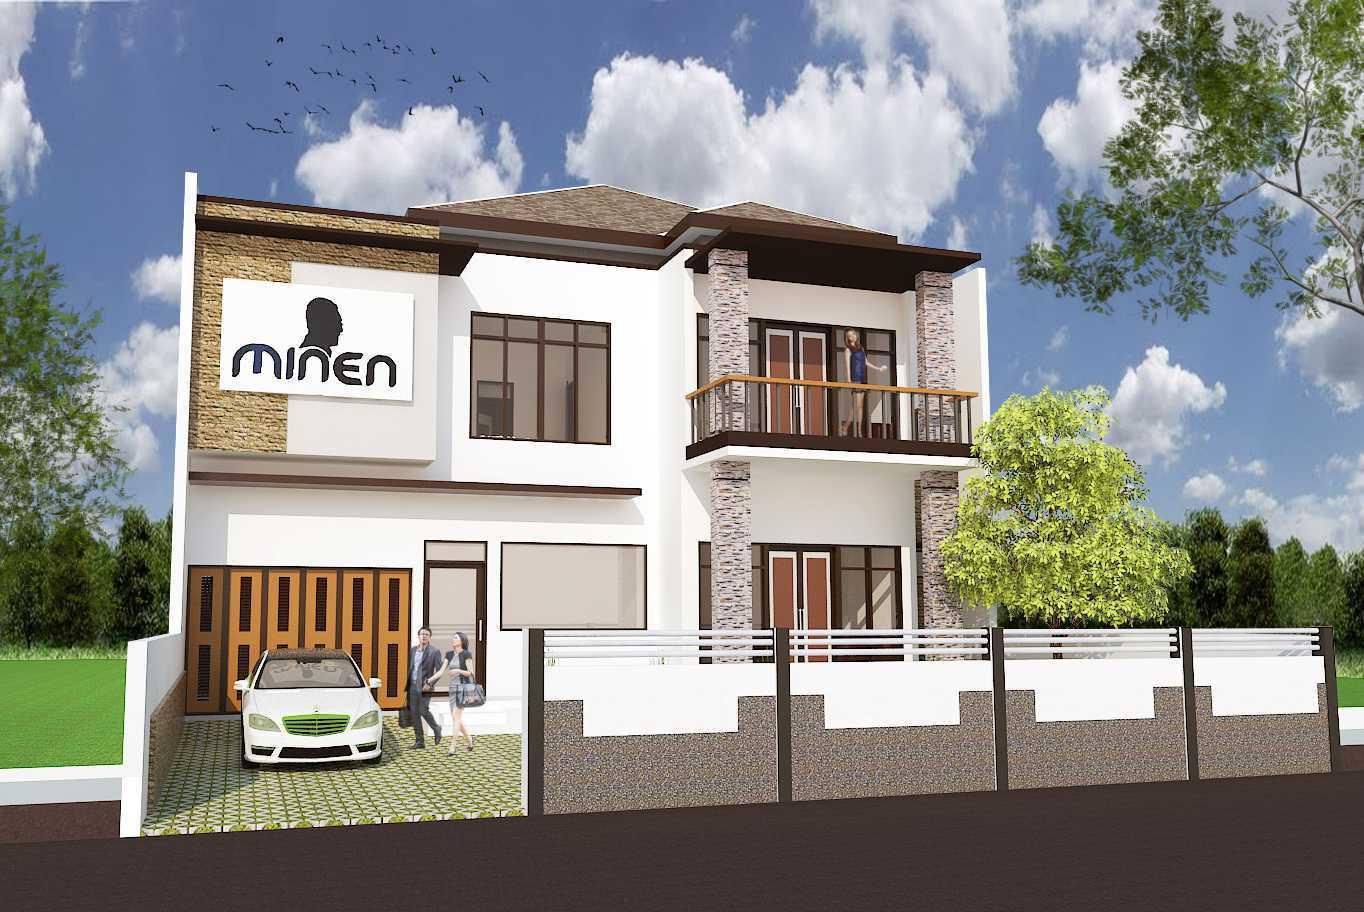 Archdesignbuild7 Rumah Tinggal 2 Lantai ( Minen )  Jl. Alfa Ii, Cigadung, Bandung Jl. Alfa Ii, Cigadung, Bandung Front View Minimalis 20141